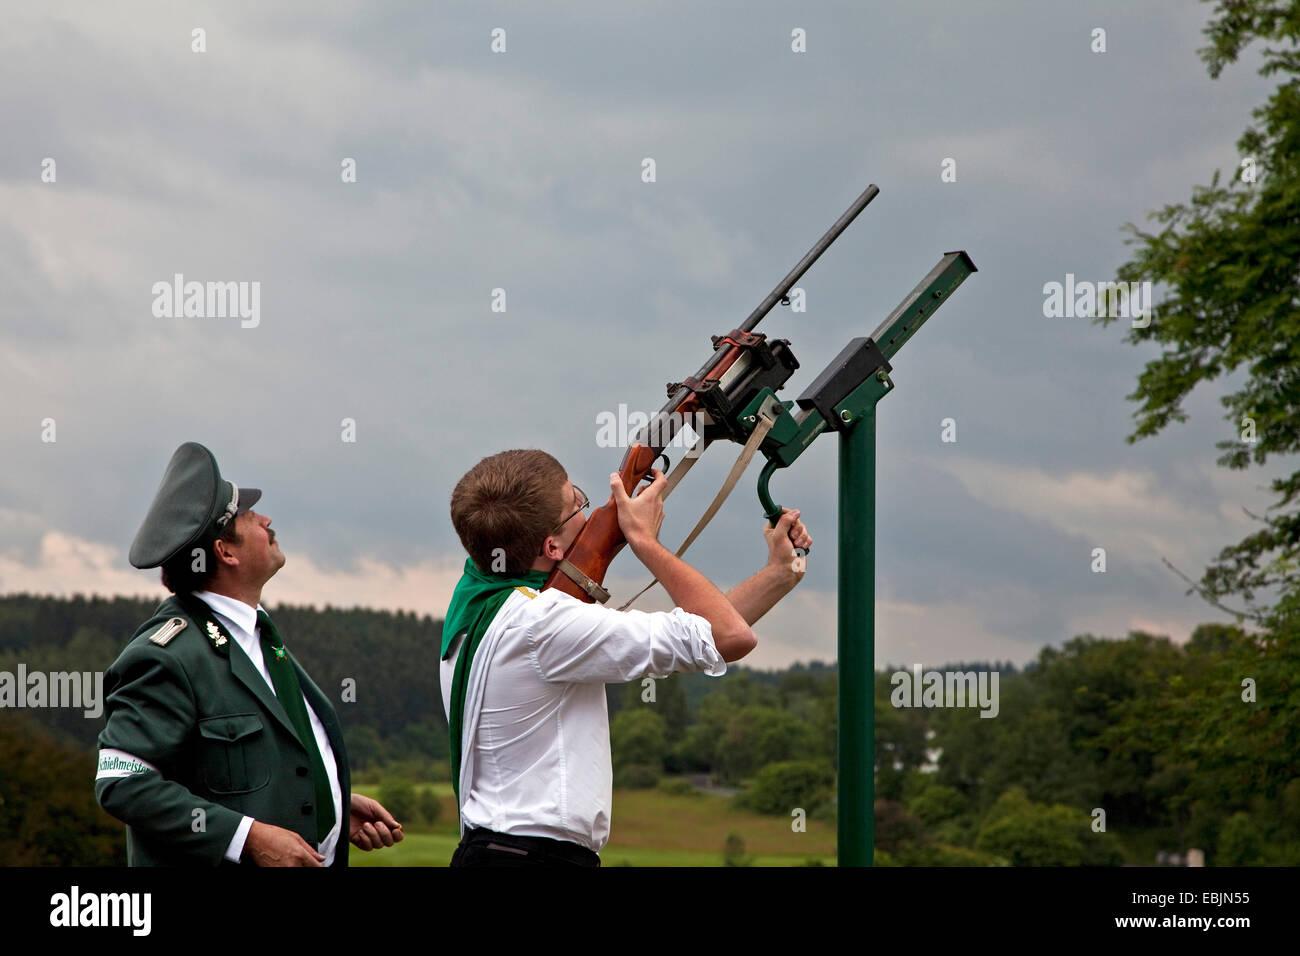 young rifleman shooting at markmen's festival in Ottfingen, Germany, North Rhine-Westphalia, Sauerland, Wenden-Huensborn Stock Photo